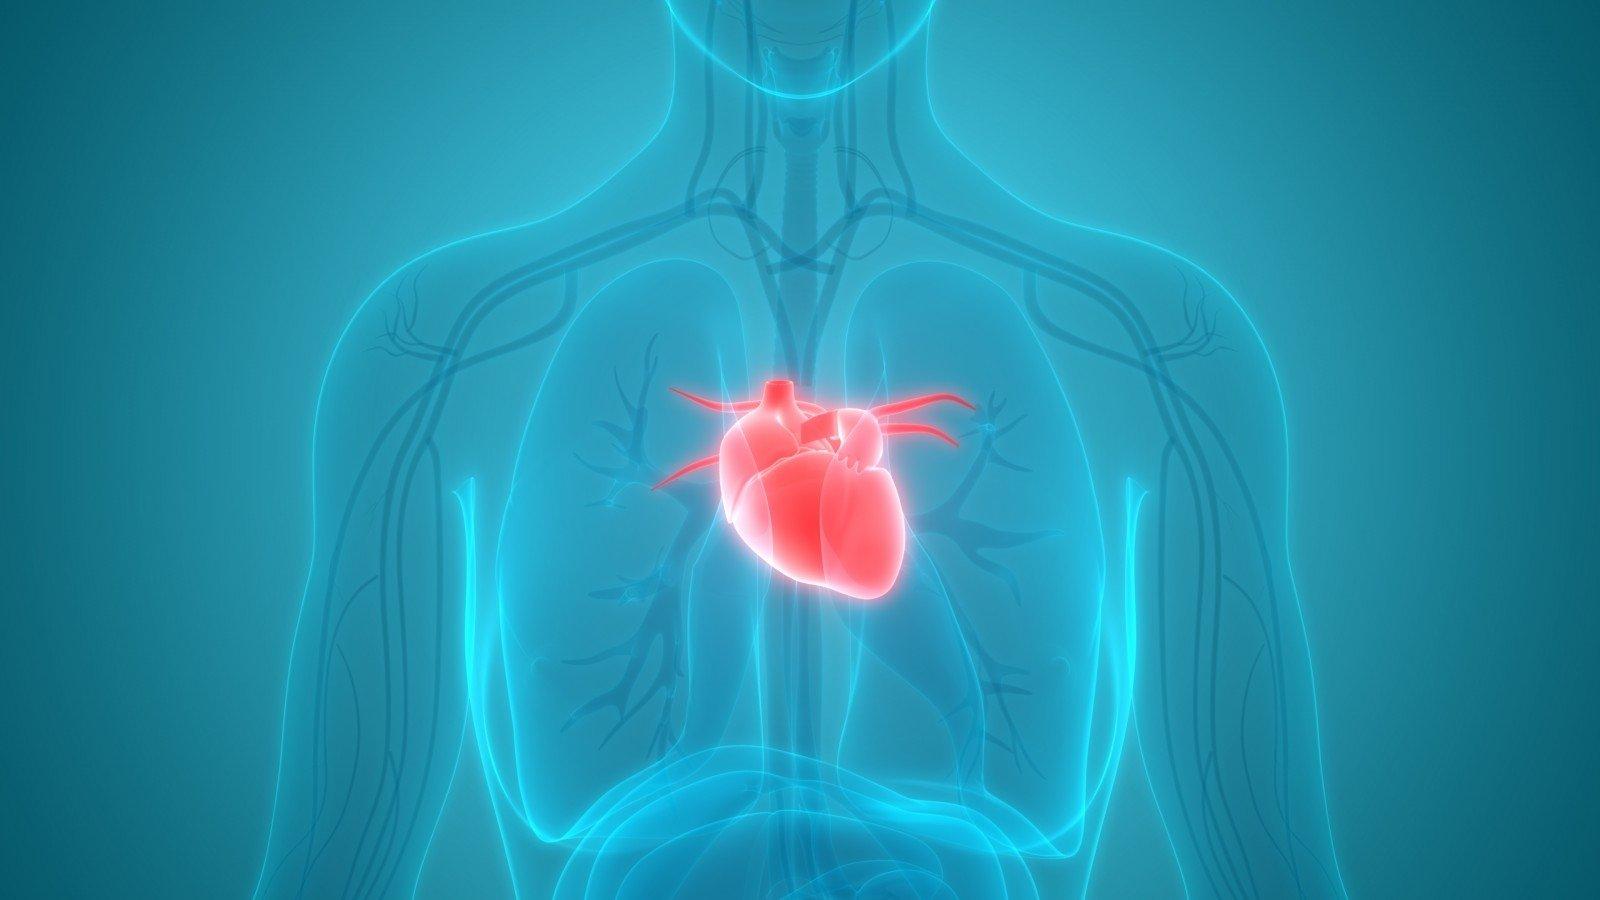 liga sveikata širdies moteris